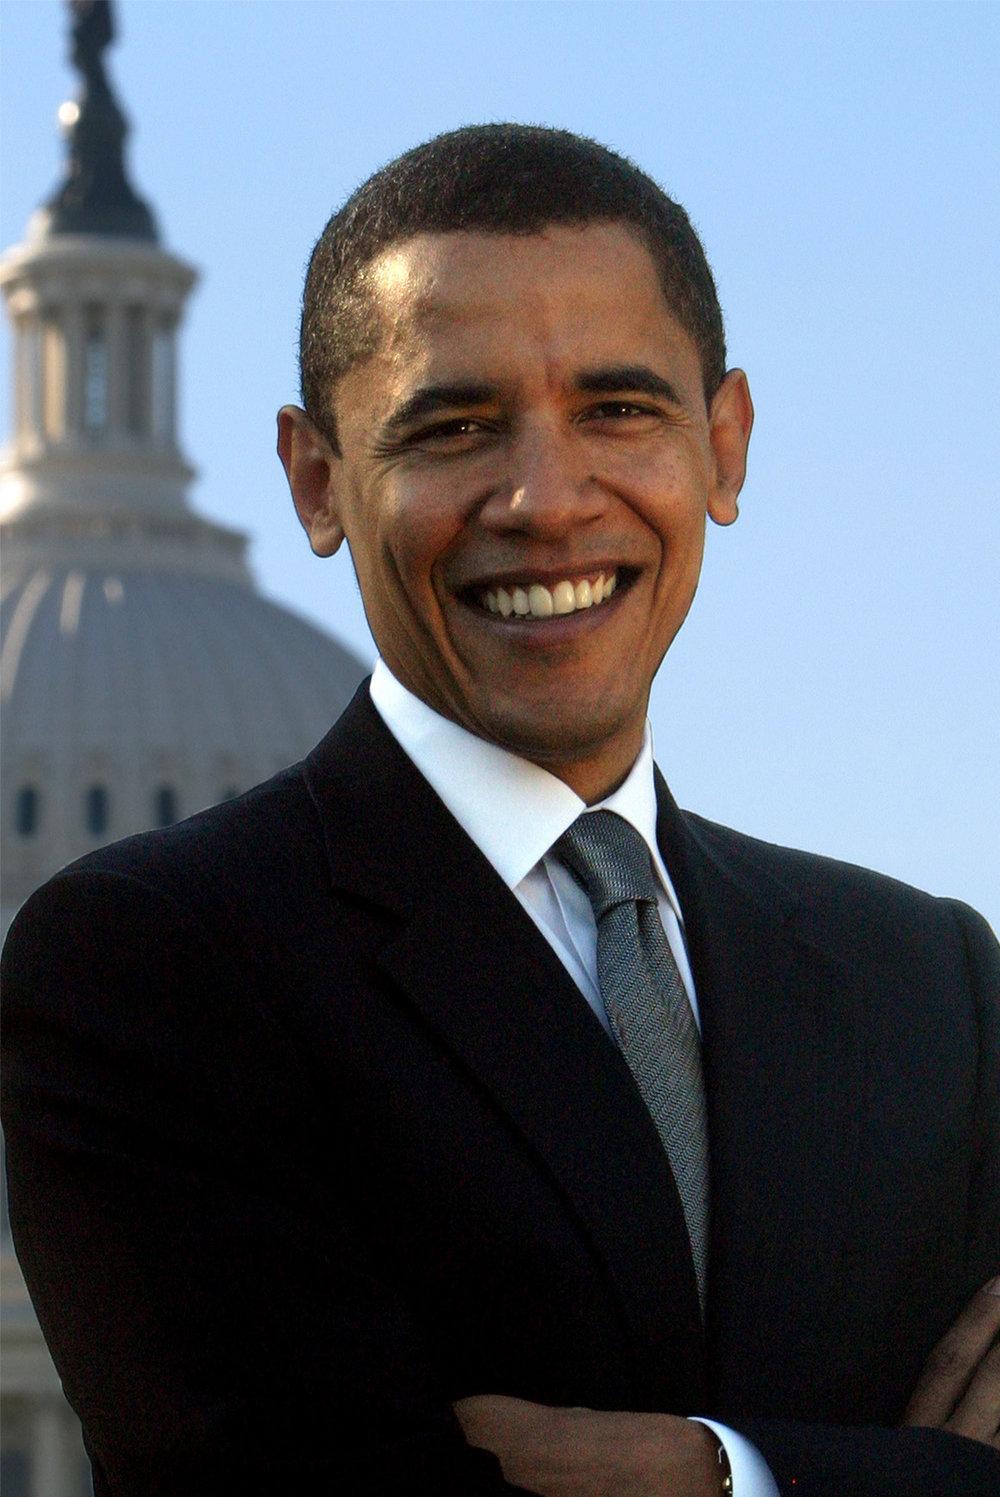 Barack Obama II